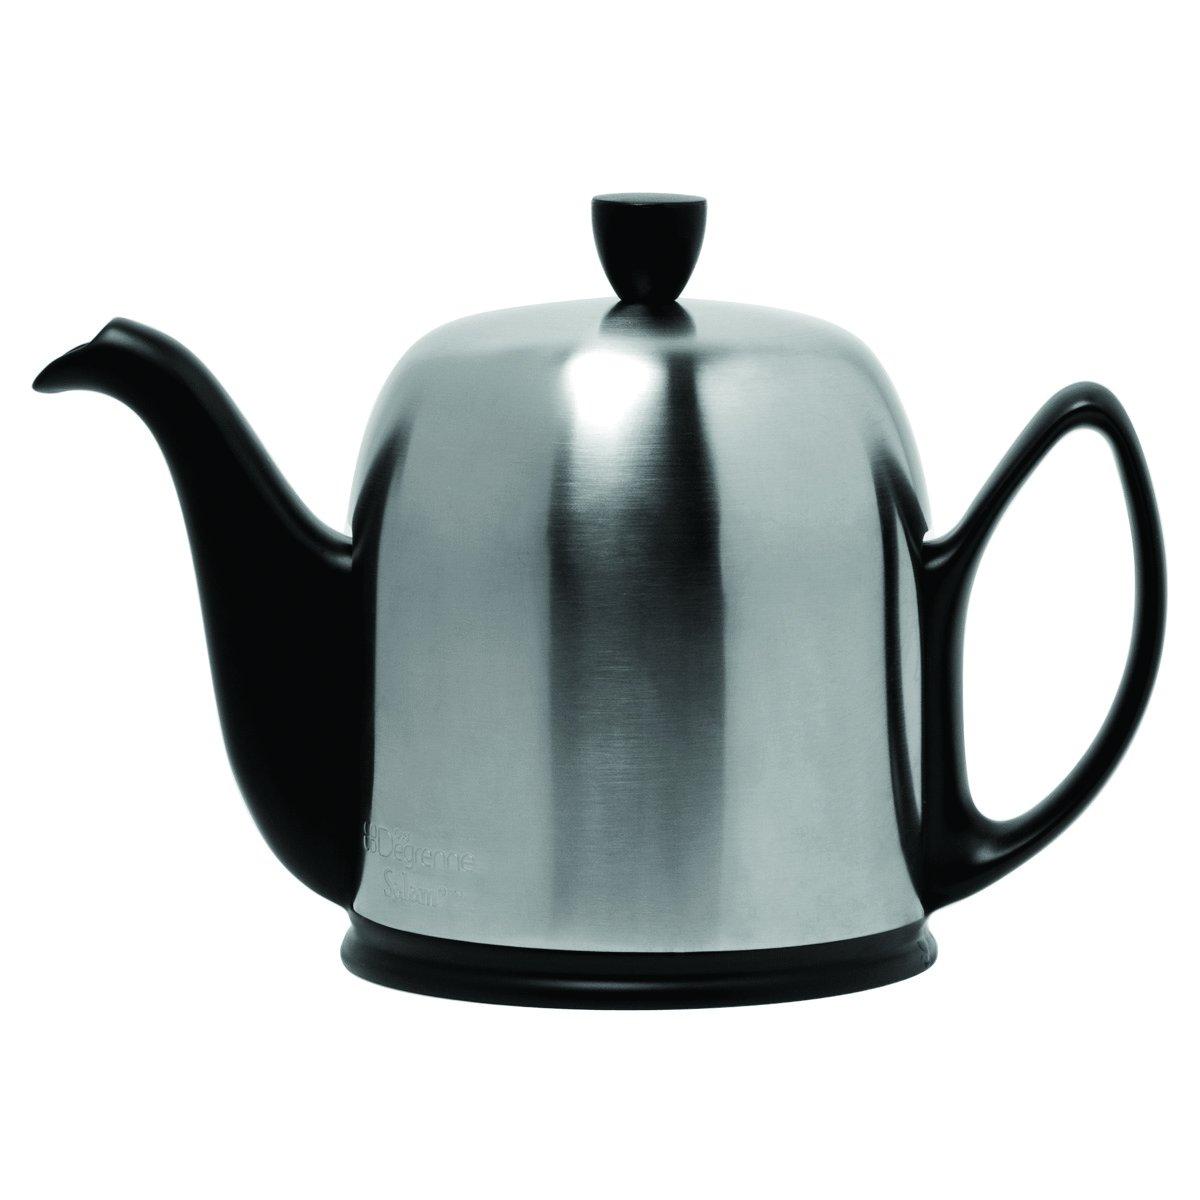 DEGRENNE -  SALAM BLACK Tea Pot 4 Cups, 23 oz 11/16